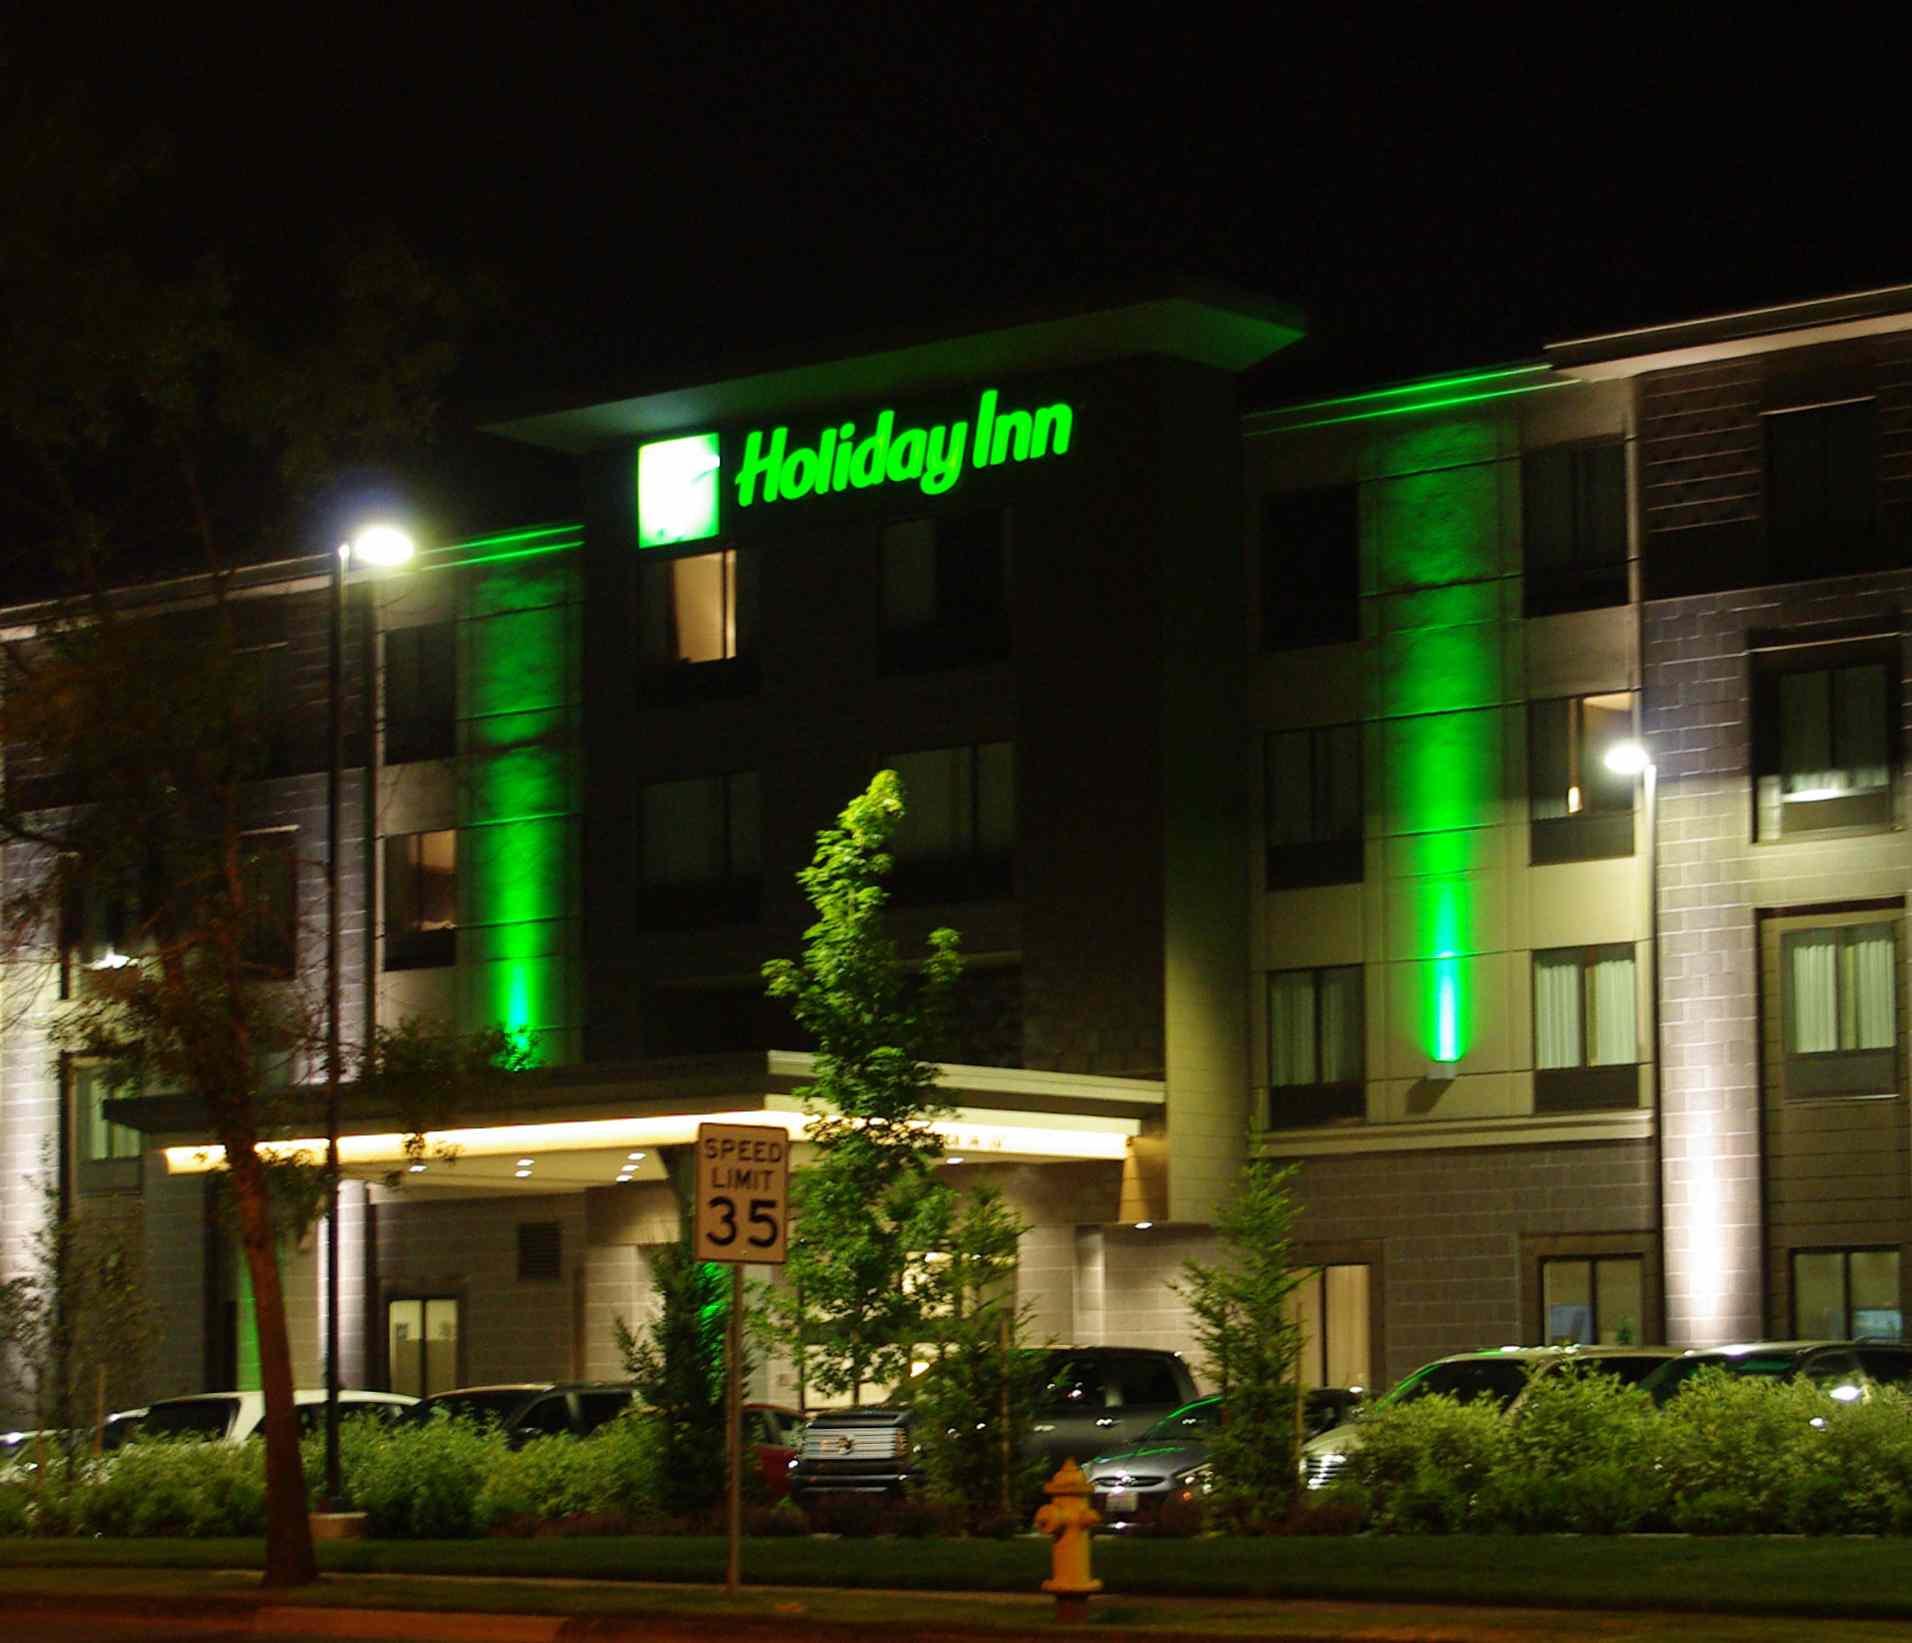 Holiday Inn at Cornell Road in w:Hillsboro, Oregon.